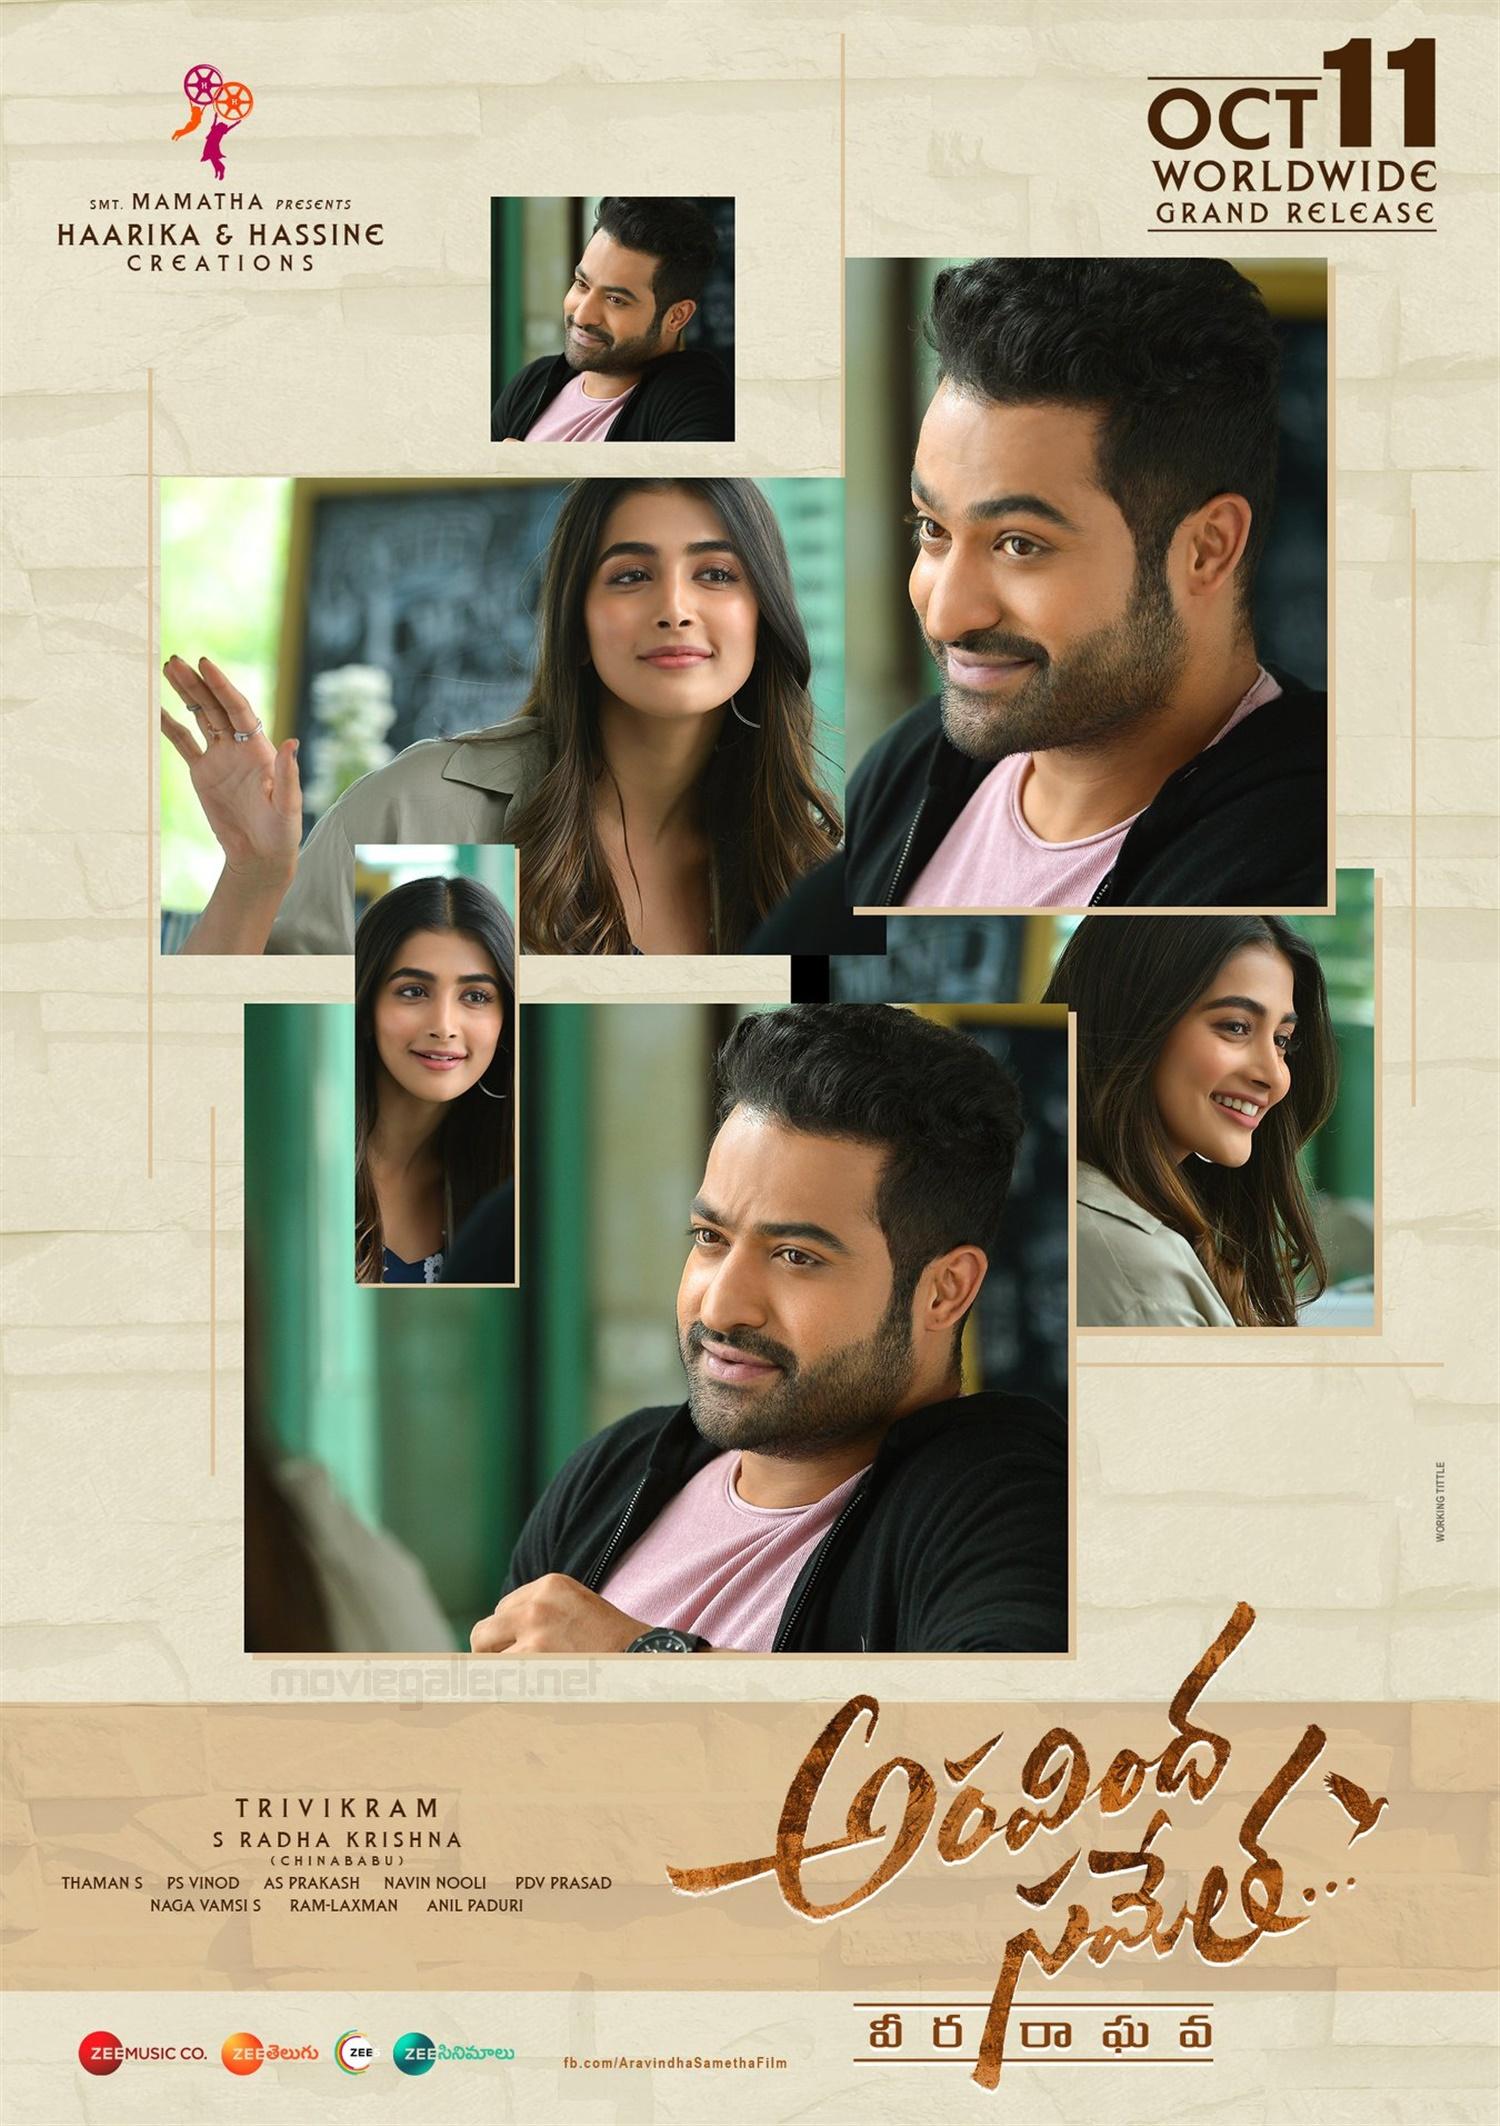 Aravinda Sametha Veera Raghava Movie Release Date Oct 11th Posters HD